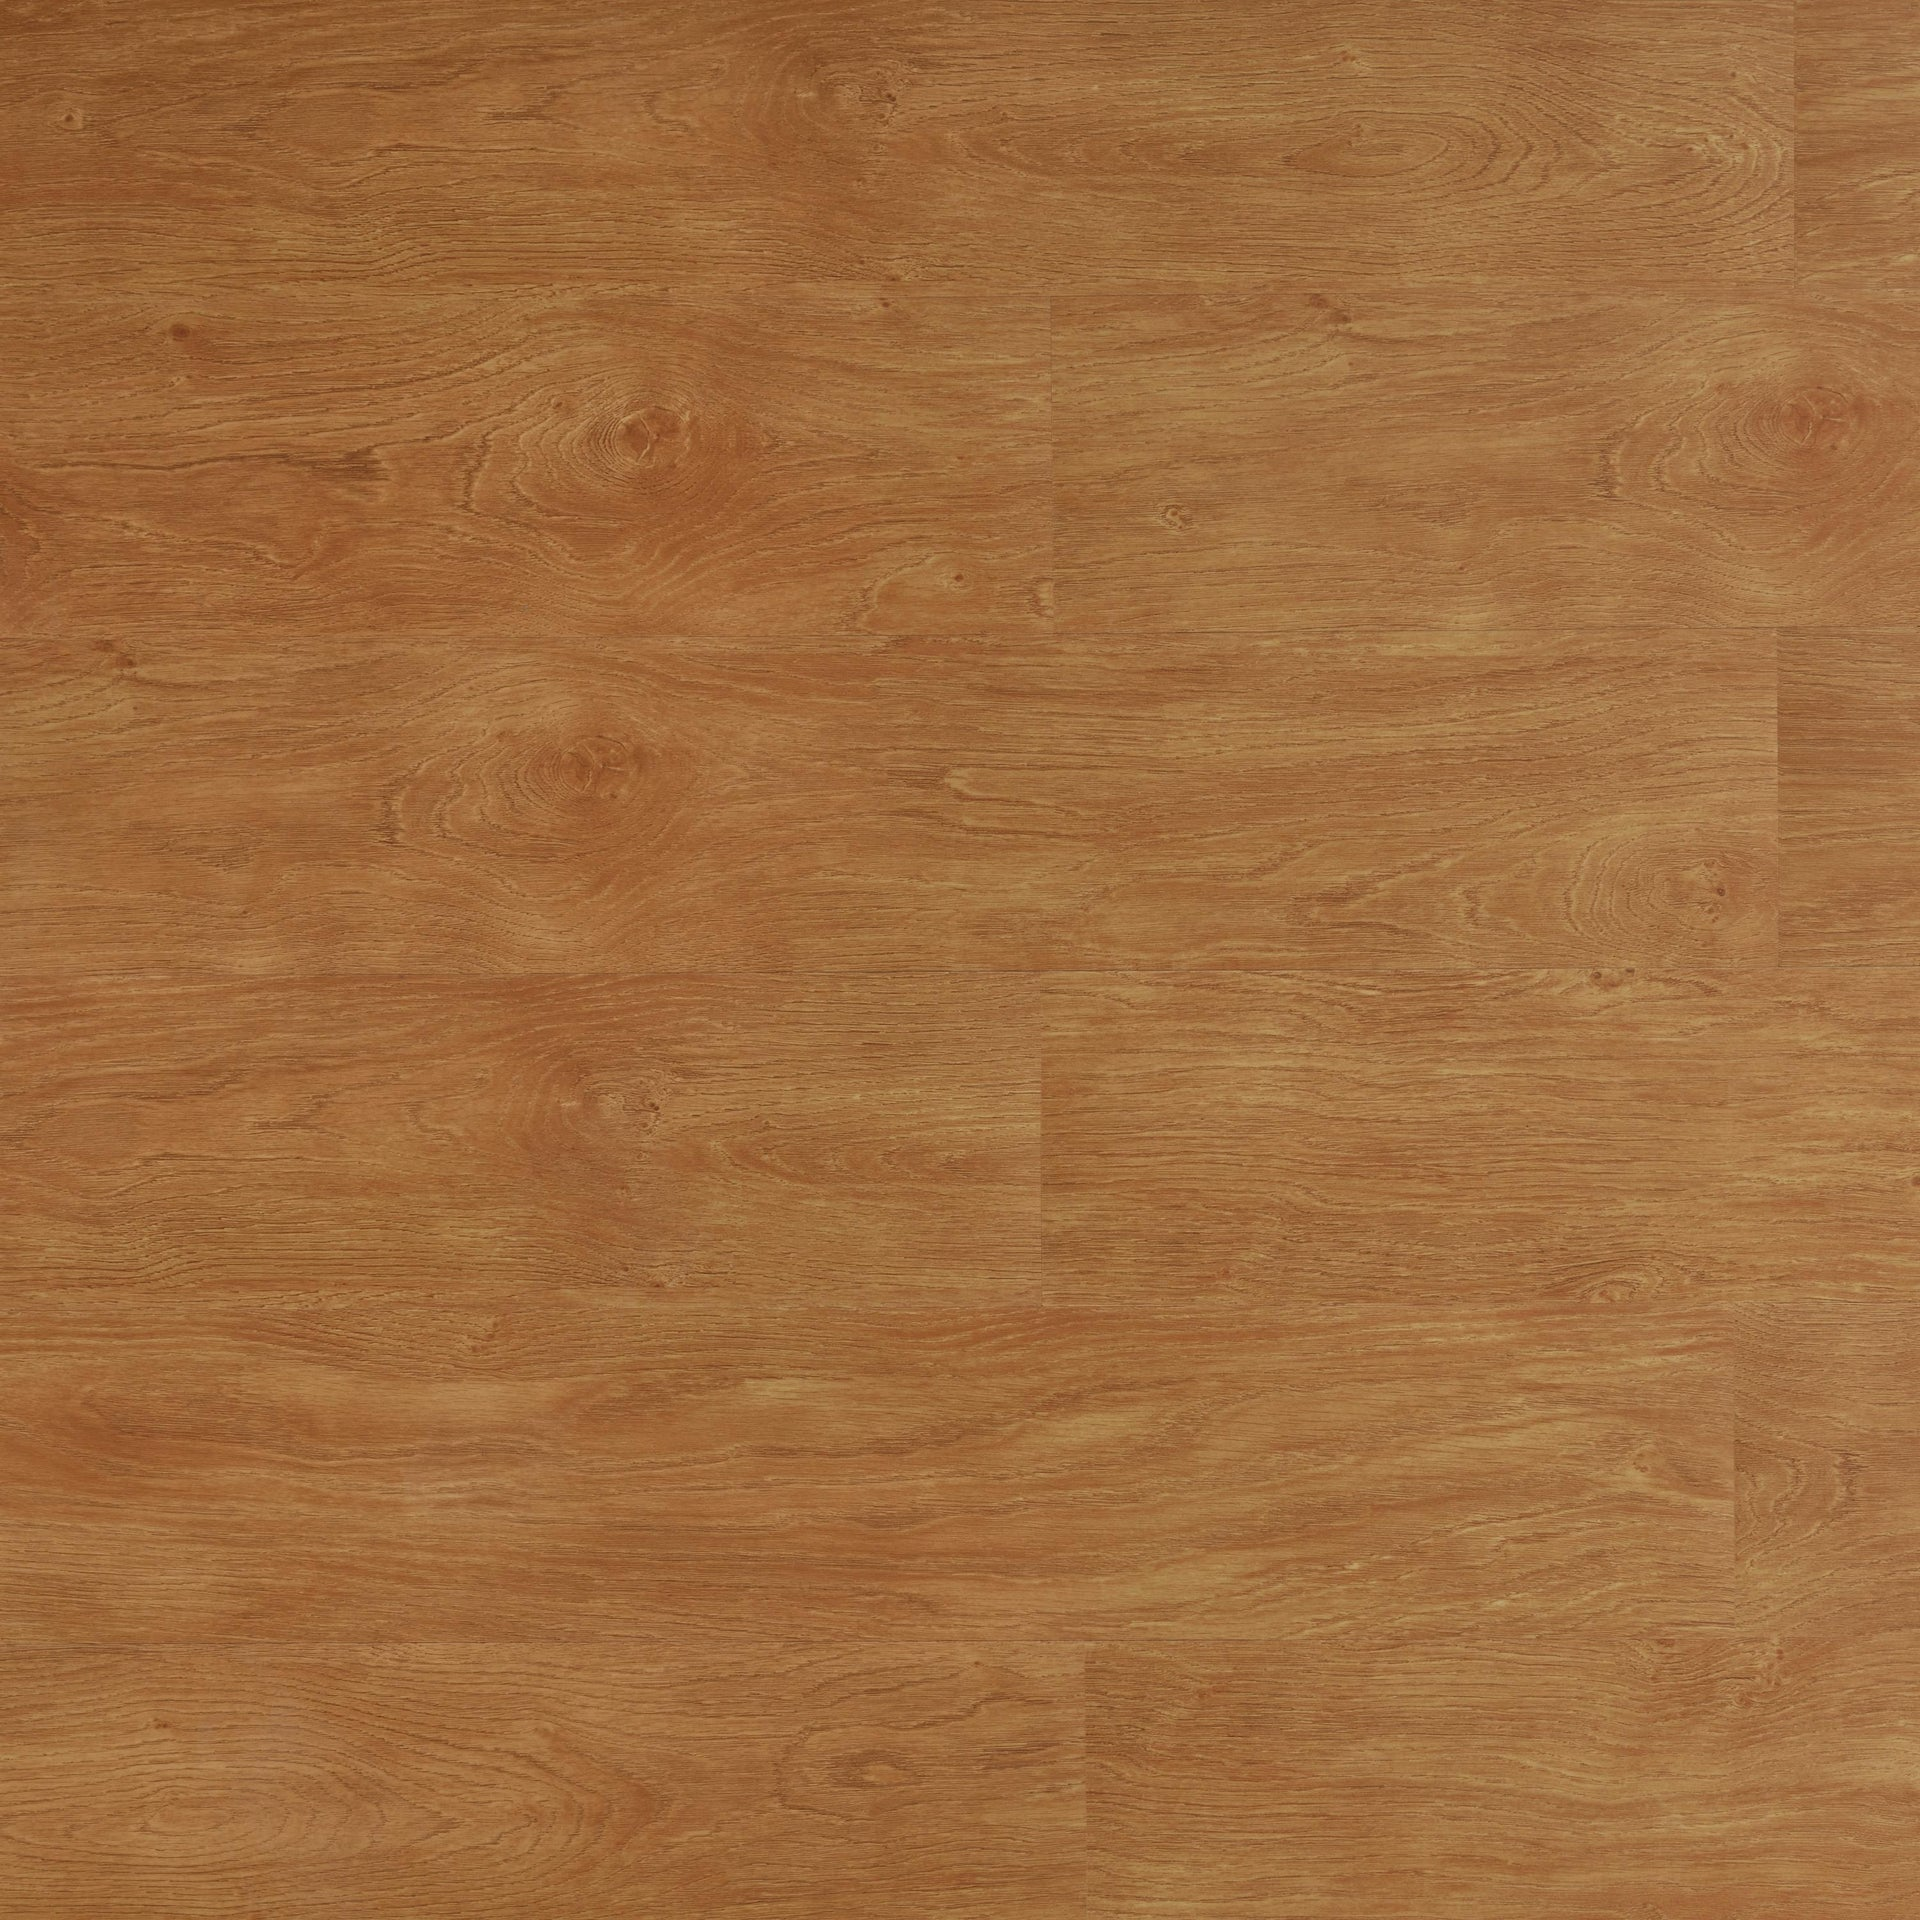 Pavimento PVC adesivo Obak Sp 1.8 mm marrone - 2